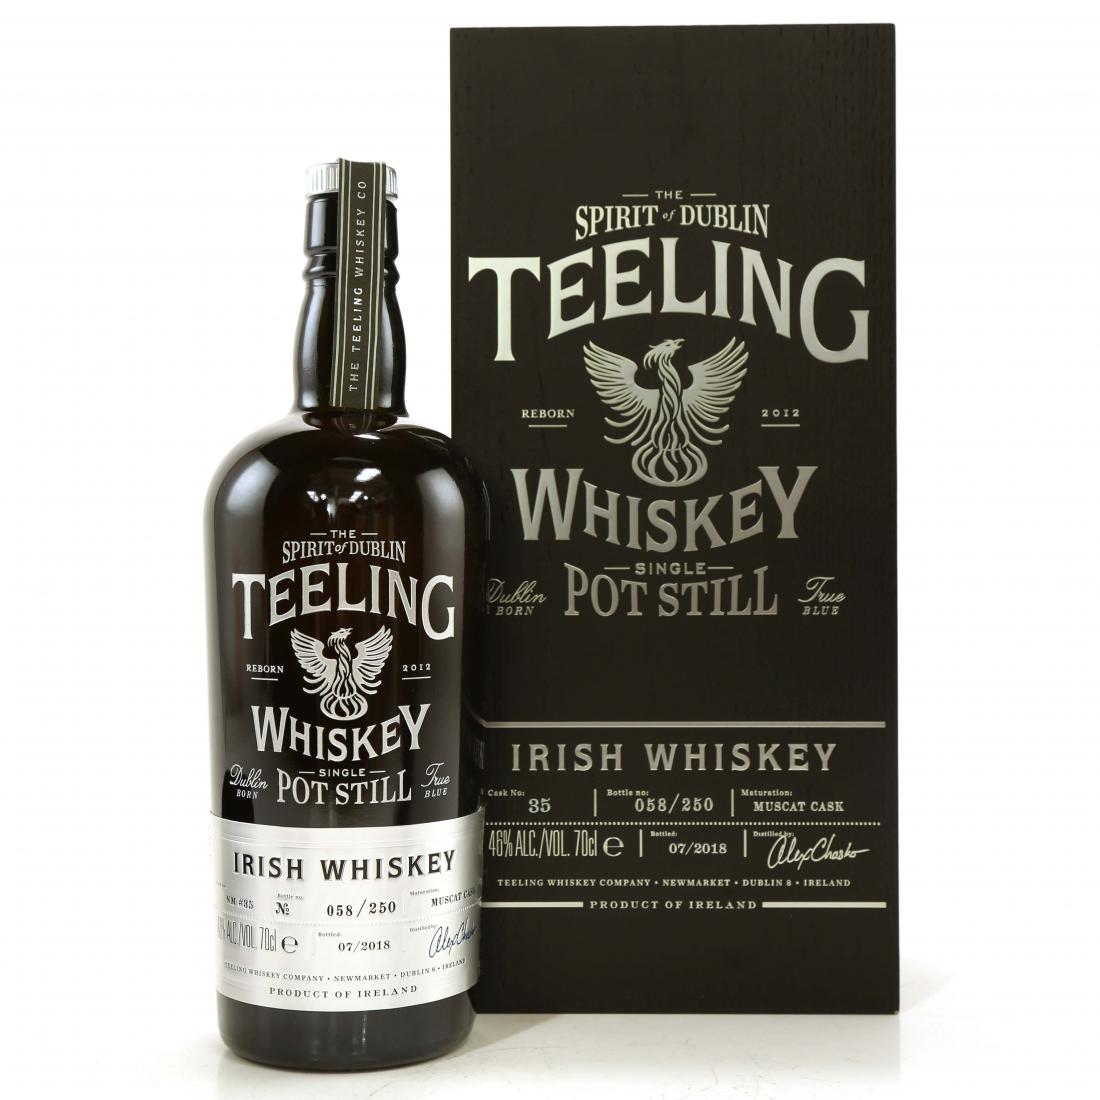 Teeling Celebratory Single Pot Still Whiskey / Bottle #058